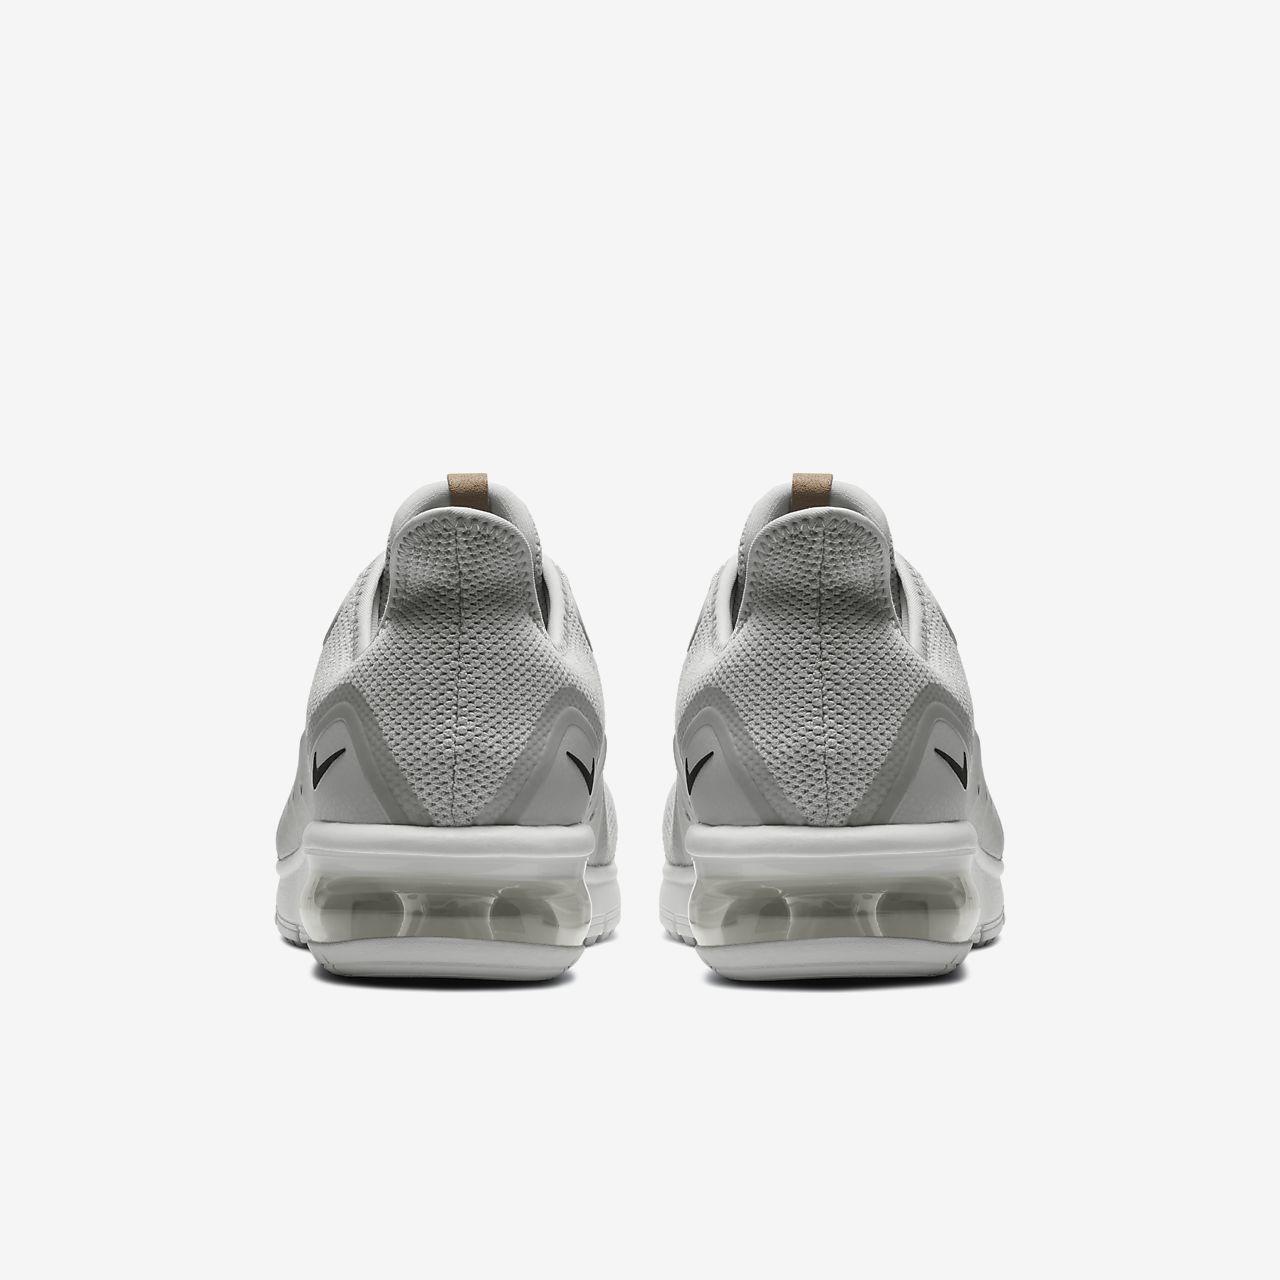 fad16c653ed8 Nike Air Max Sequent 3 Men s Shoe. Nike.com ZA